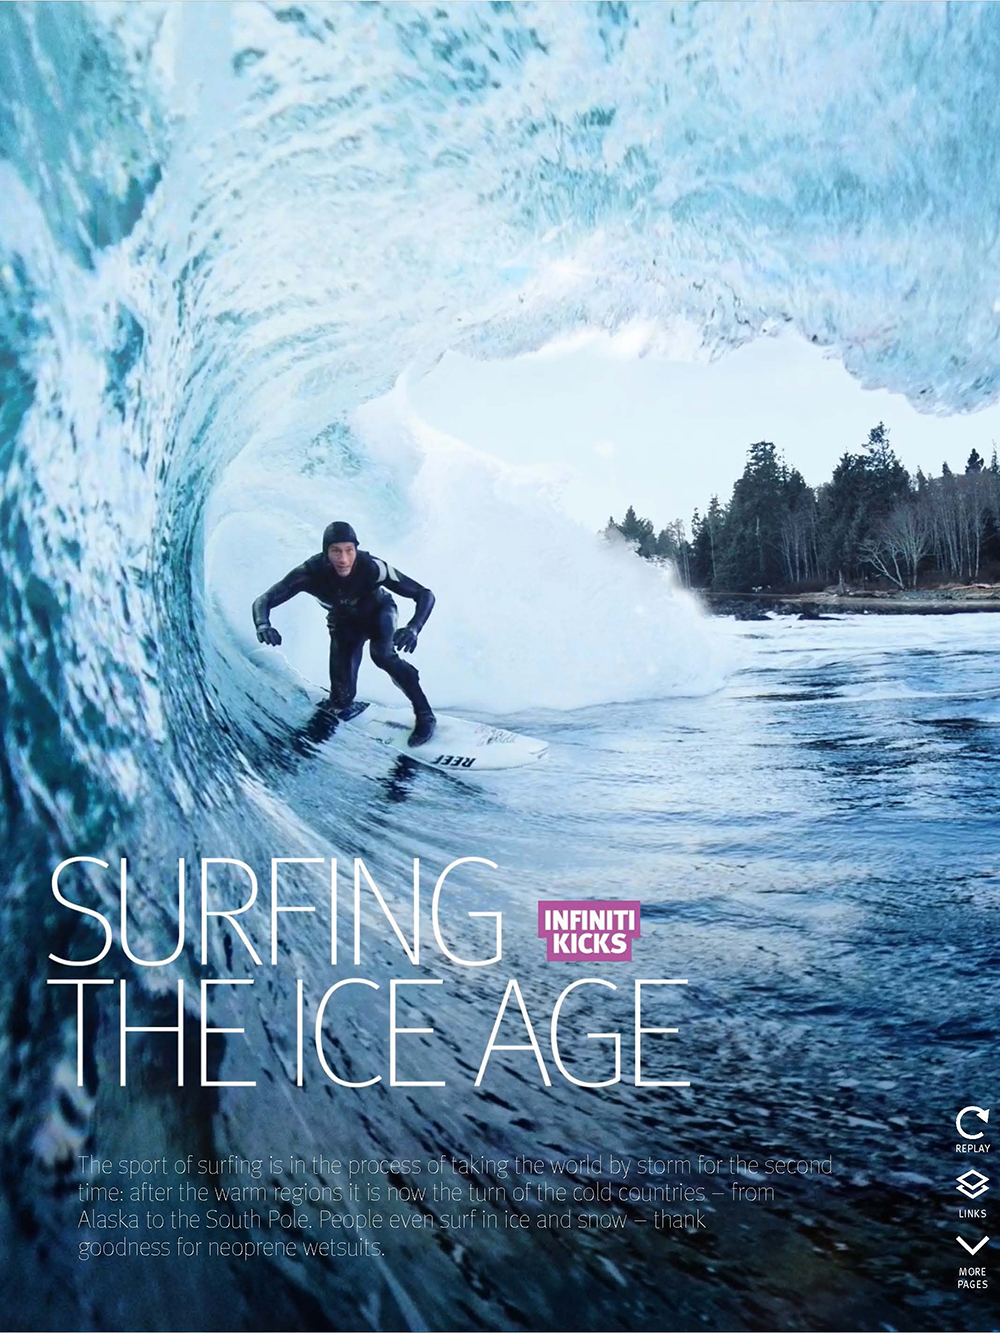 Infiniti_Surfing_Page_1.jpg